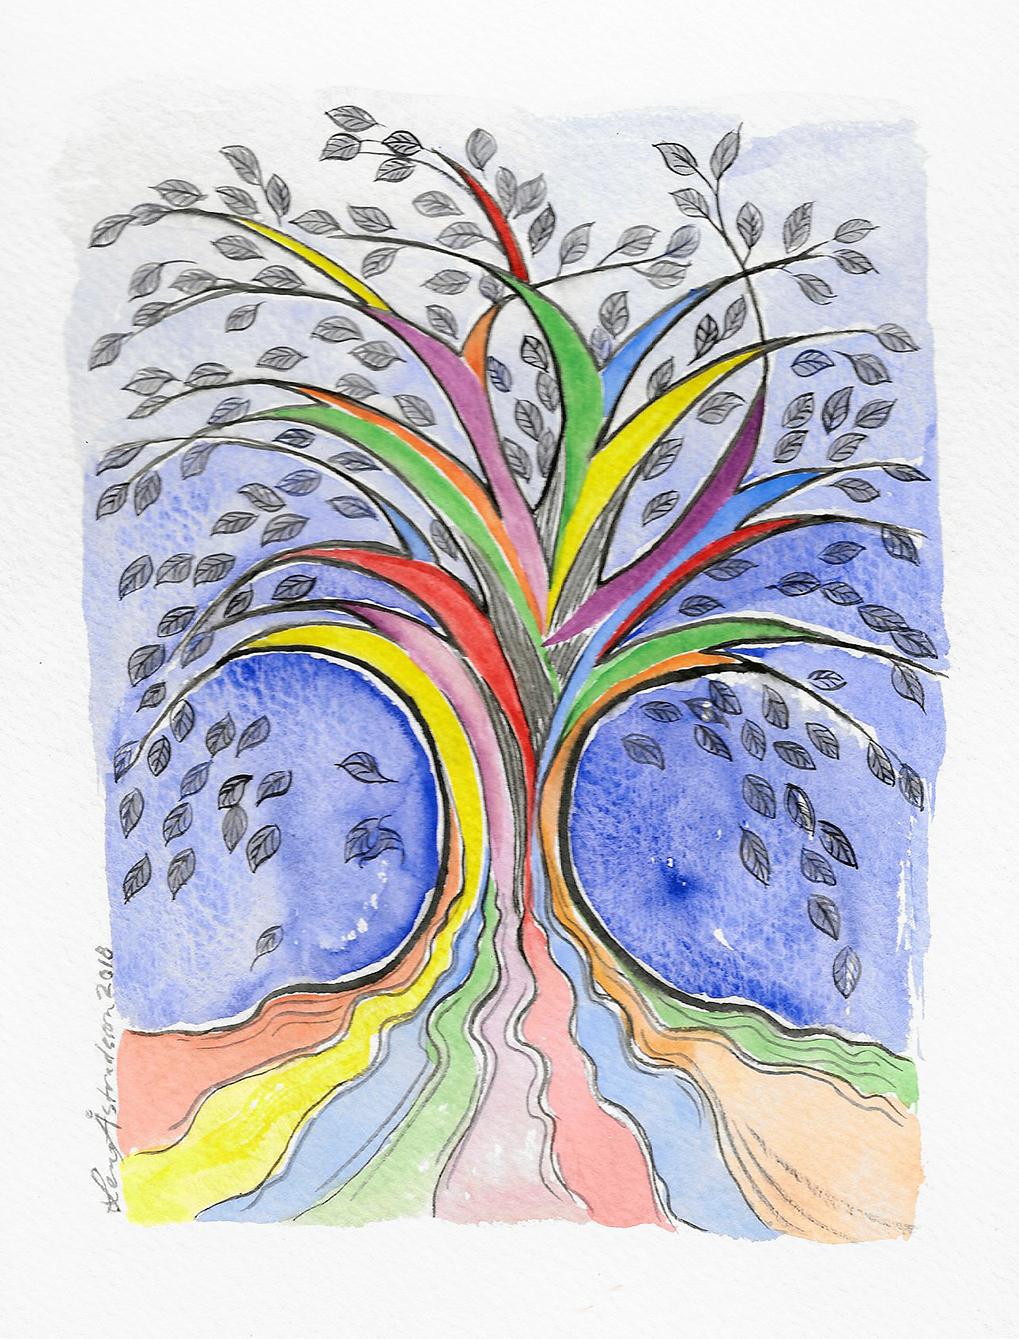 fargglatt_tree